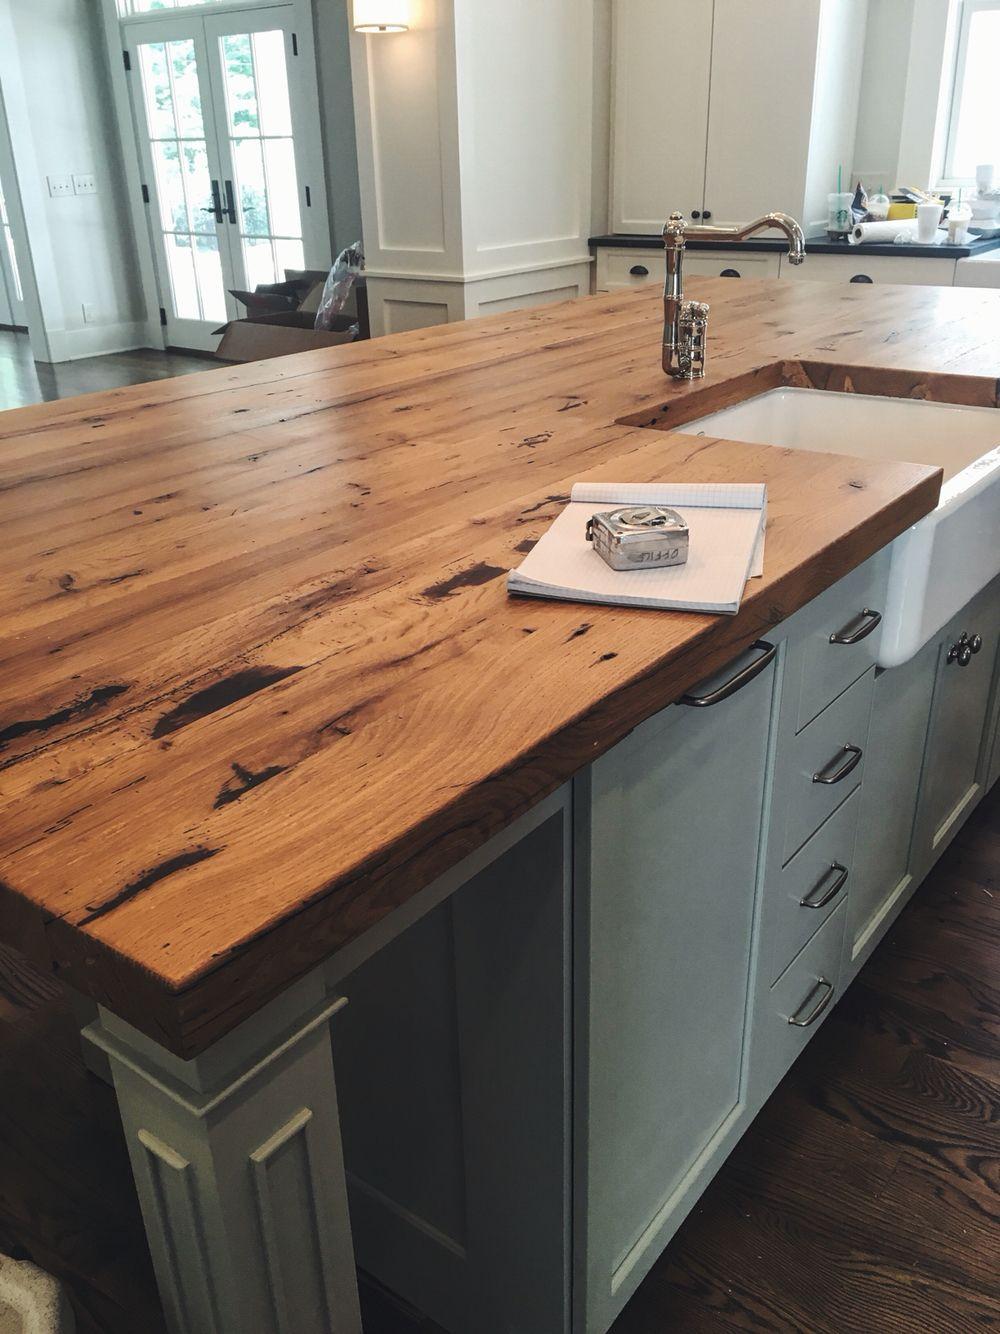 Exceptionnel Reclaimed Oak Kitchen Countertop // Built By Woodstock Vintage Lumber In  Nashville, TN.